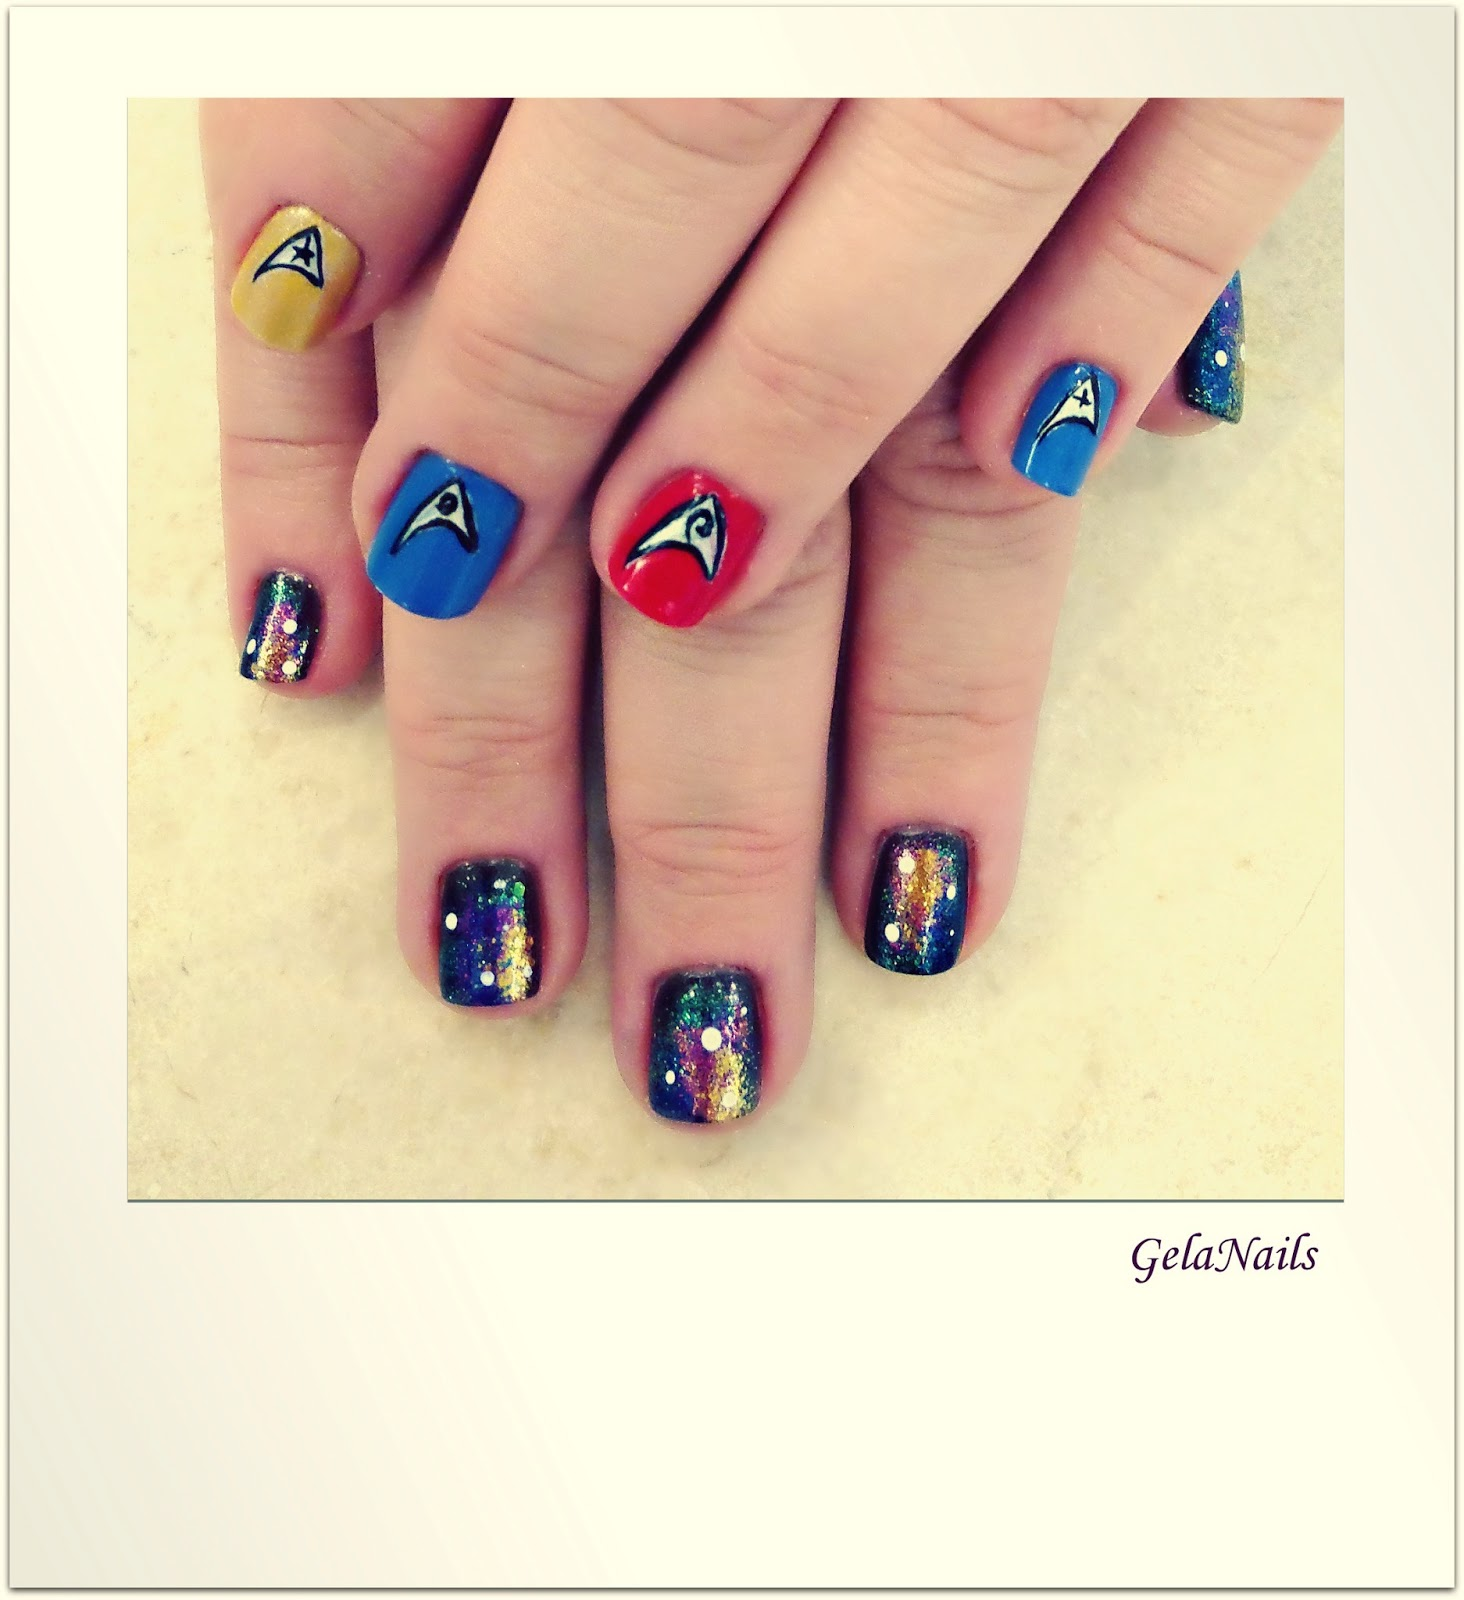 Science Nail Designs: GelaNails: Star Trek Nails